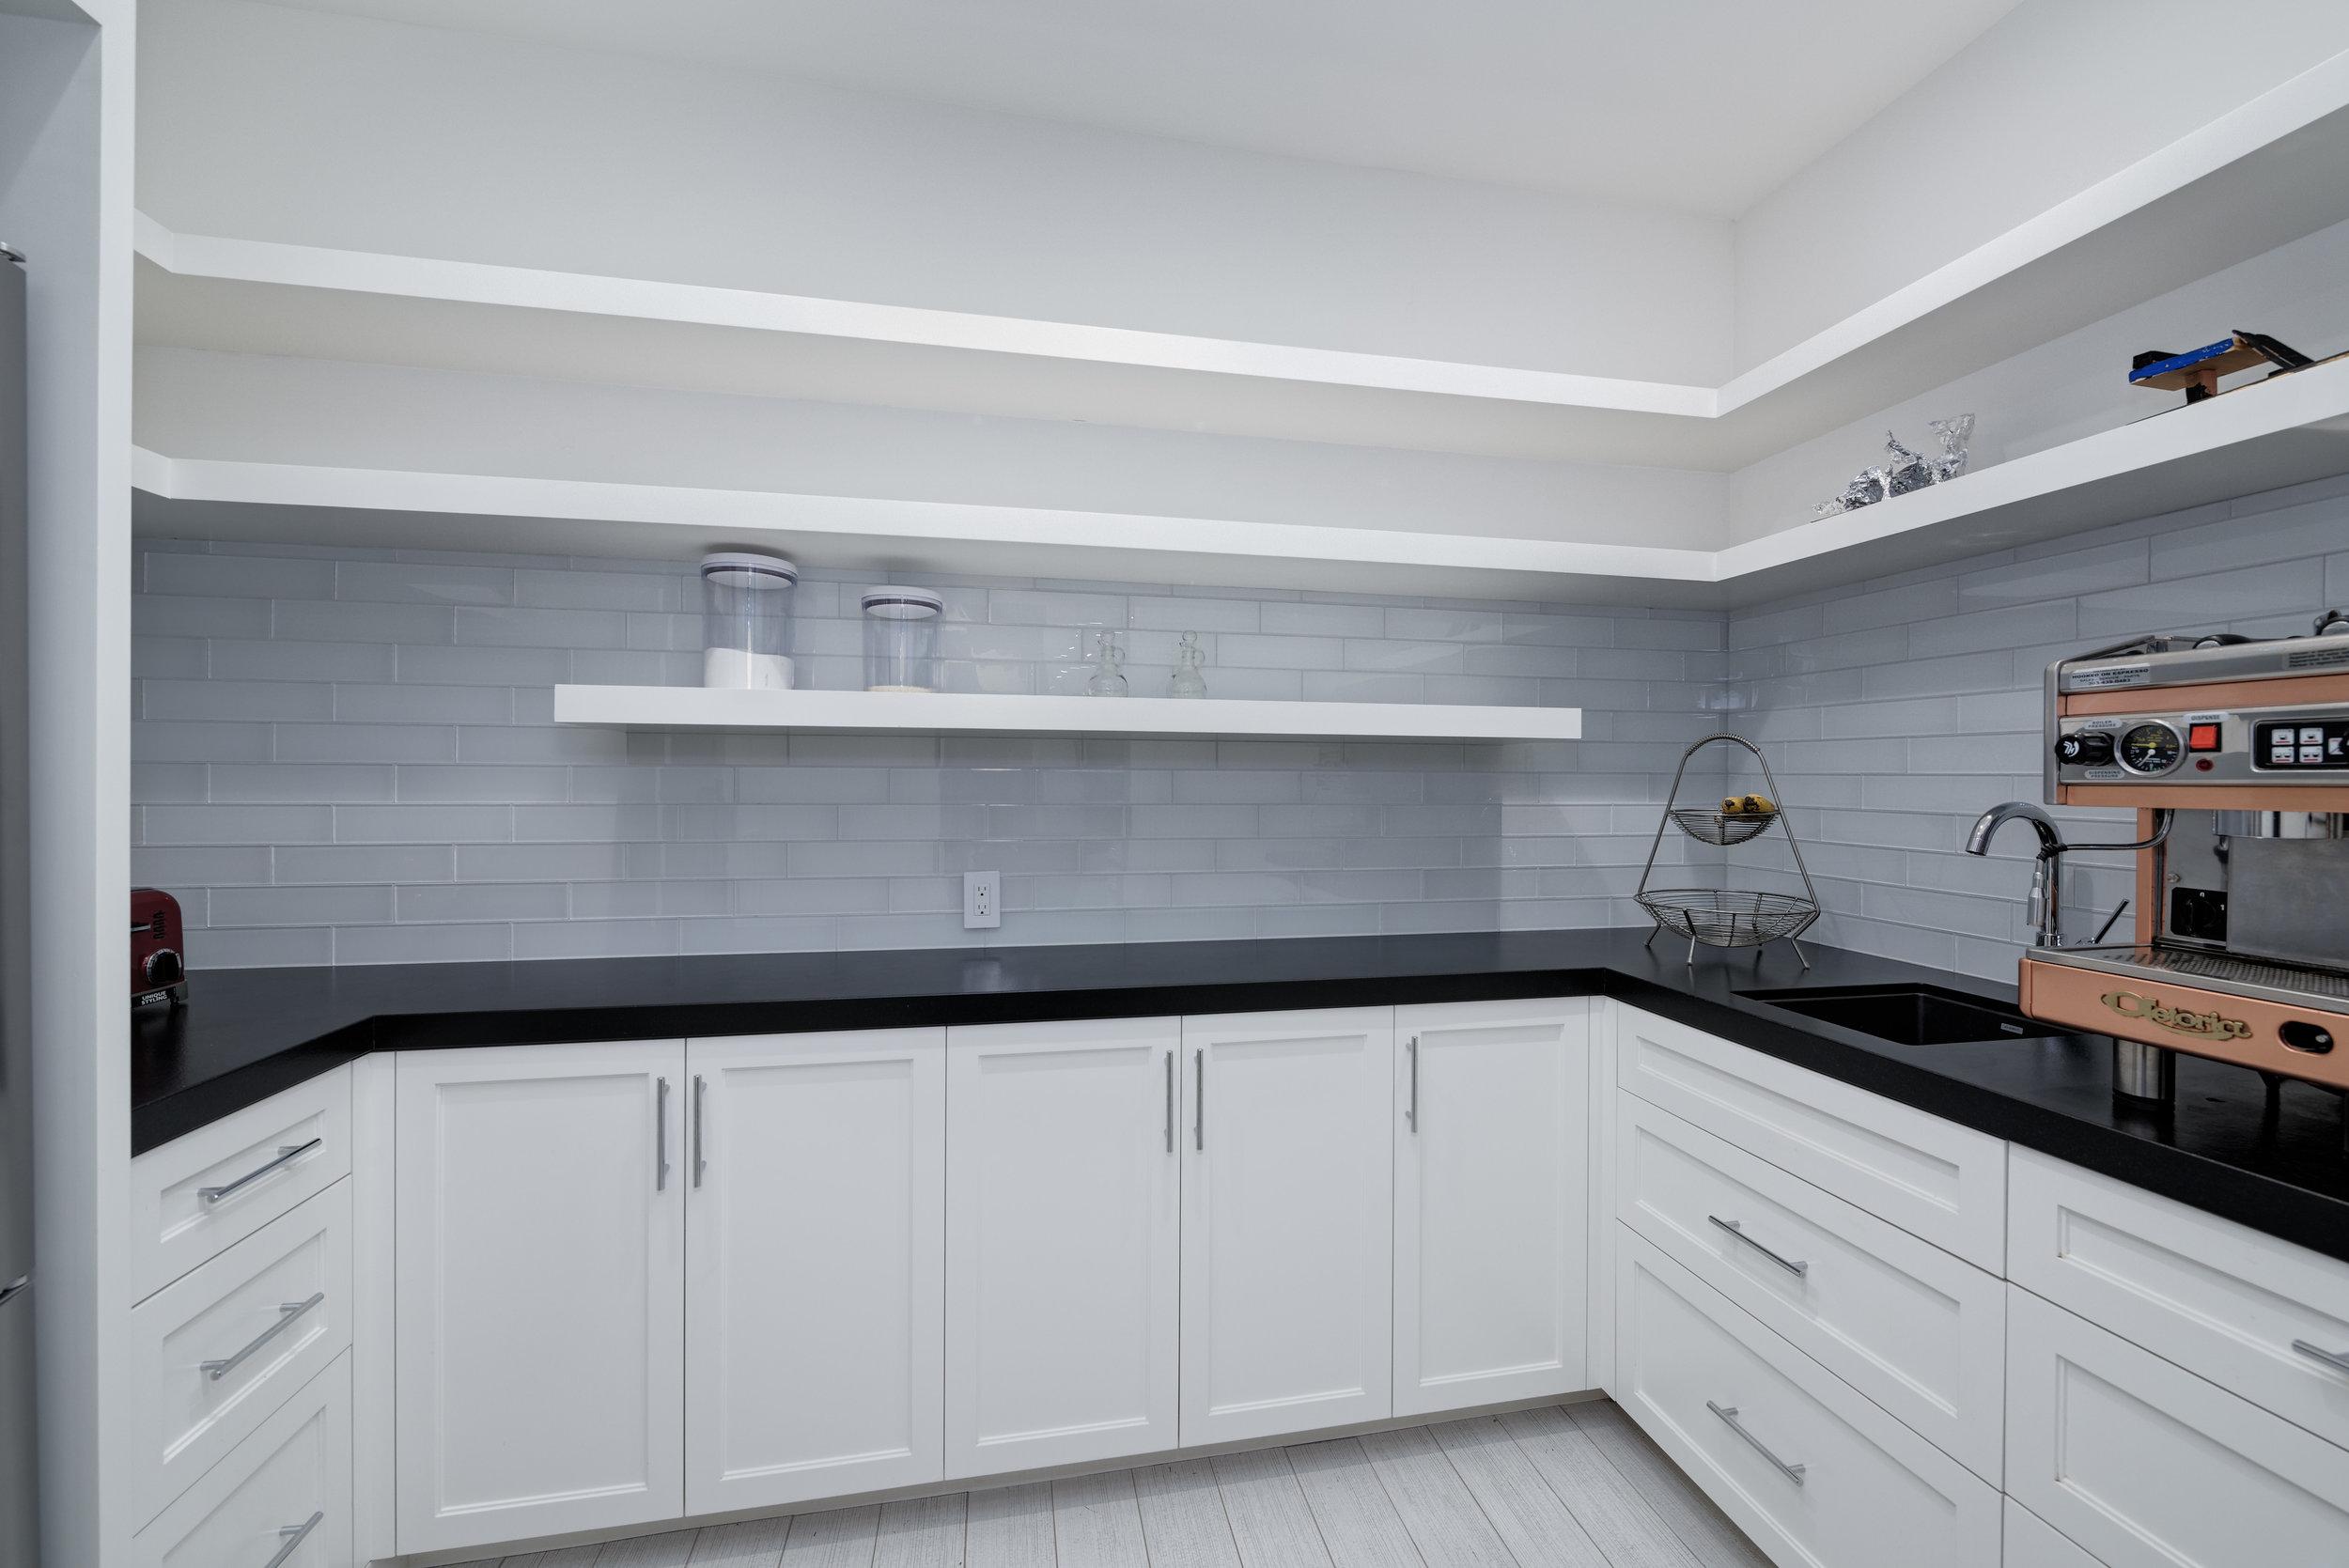 17_kitchen pantry.jpg